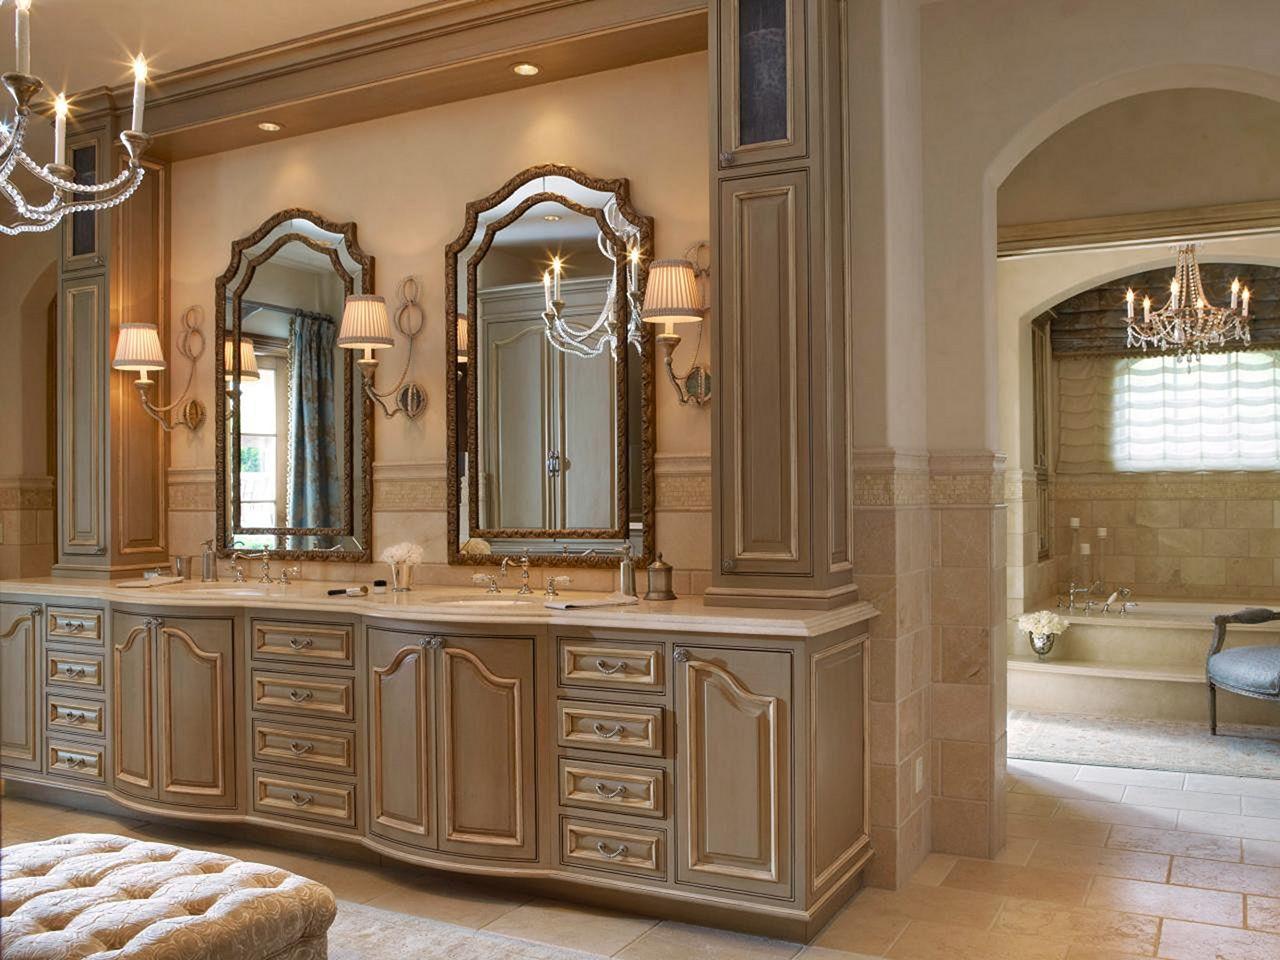 Luxurious Bathroom Vanity 4